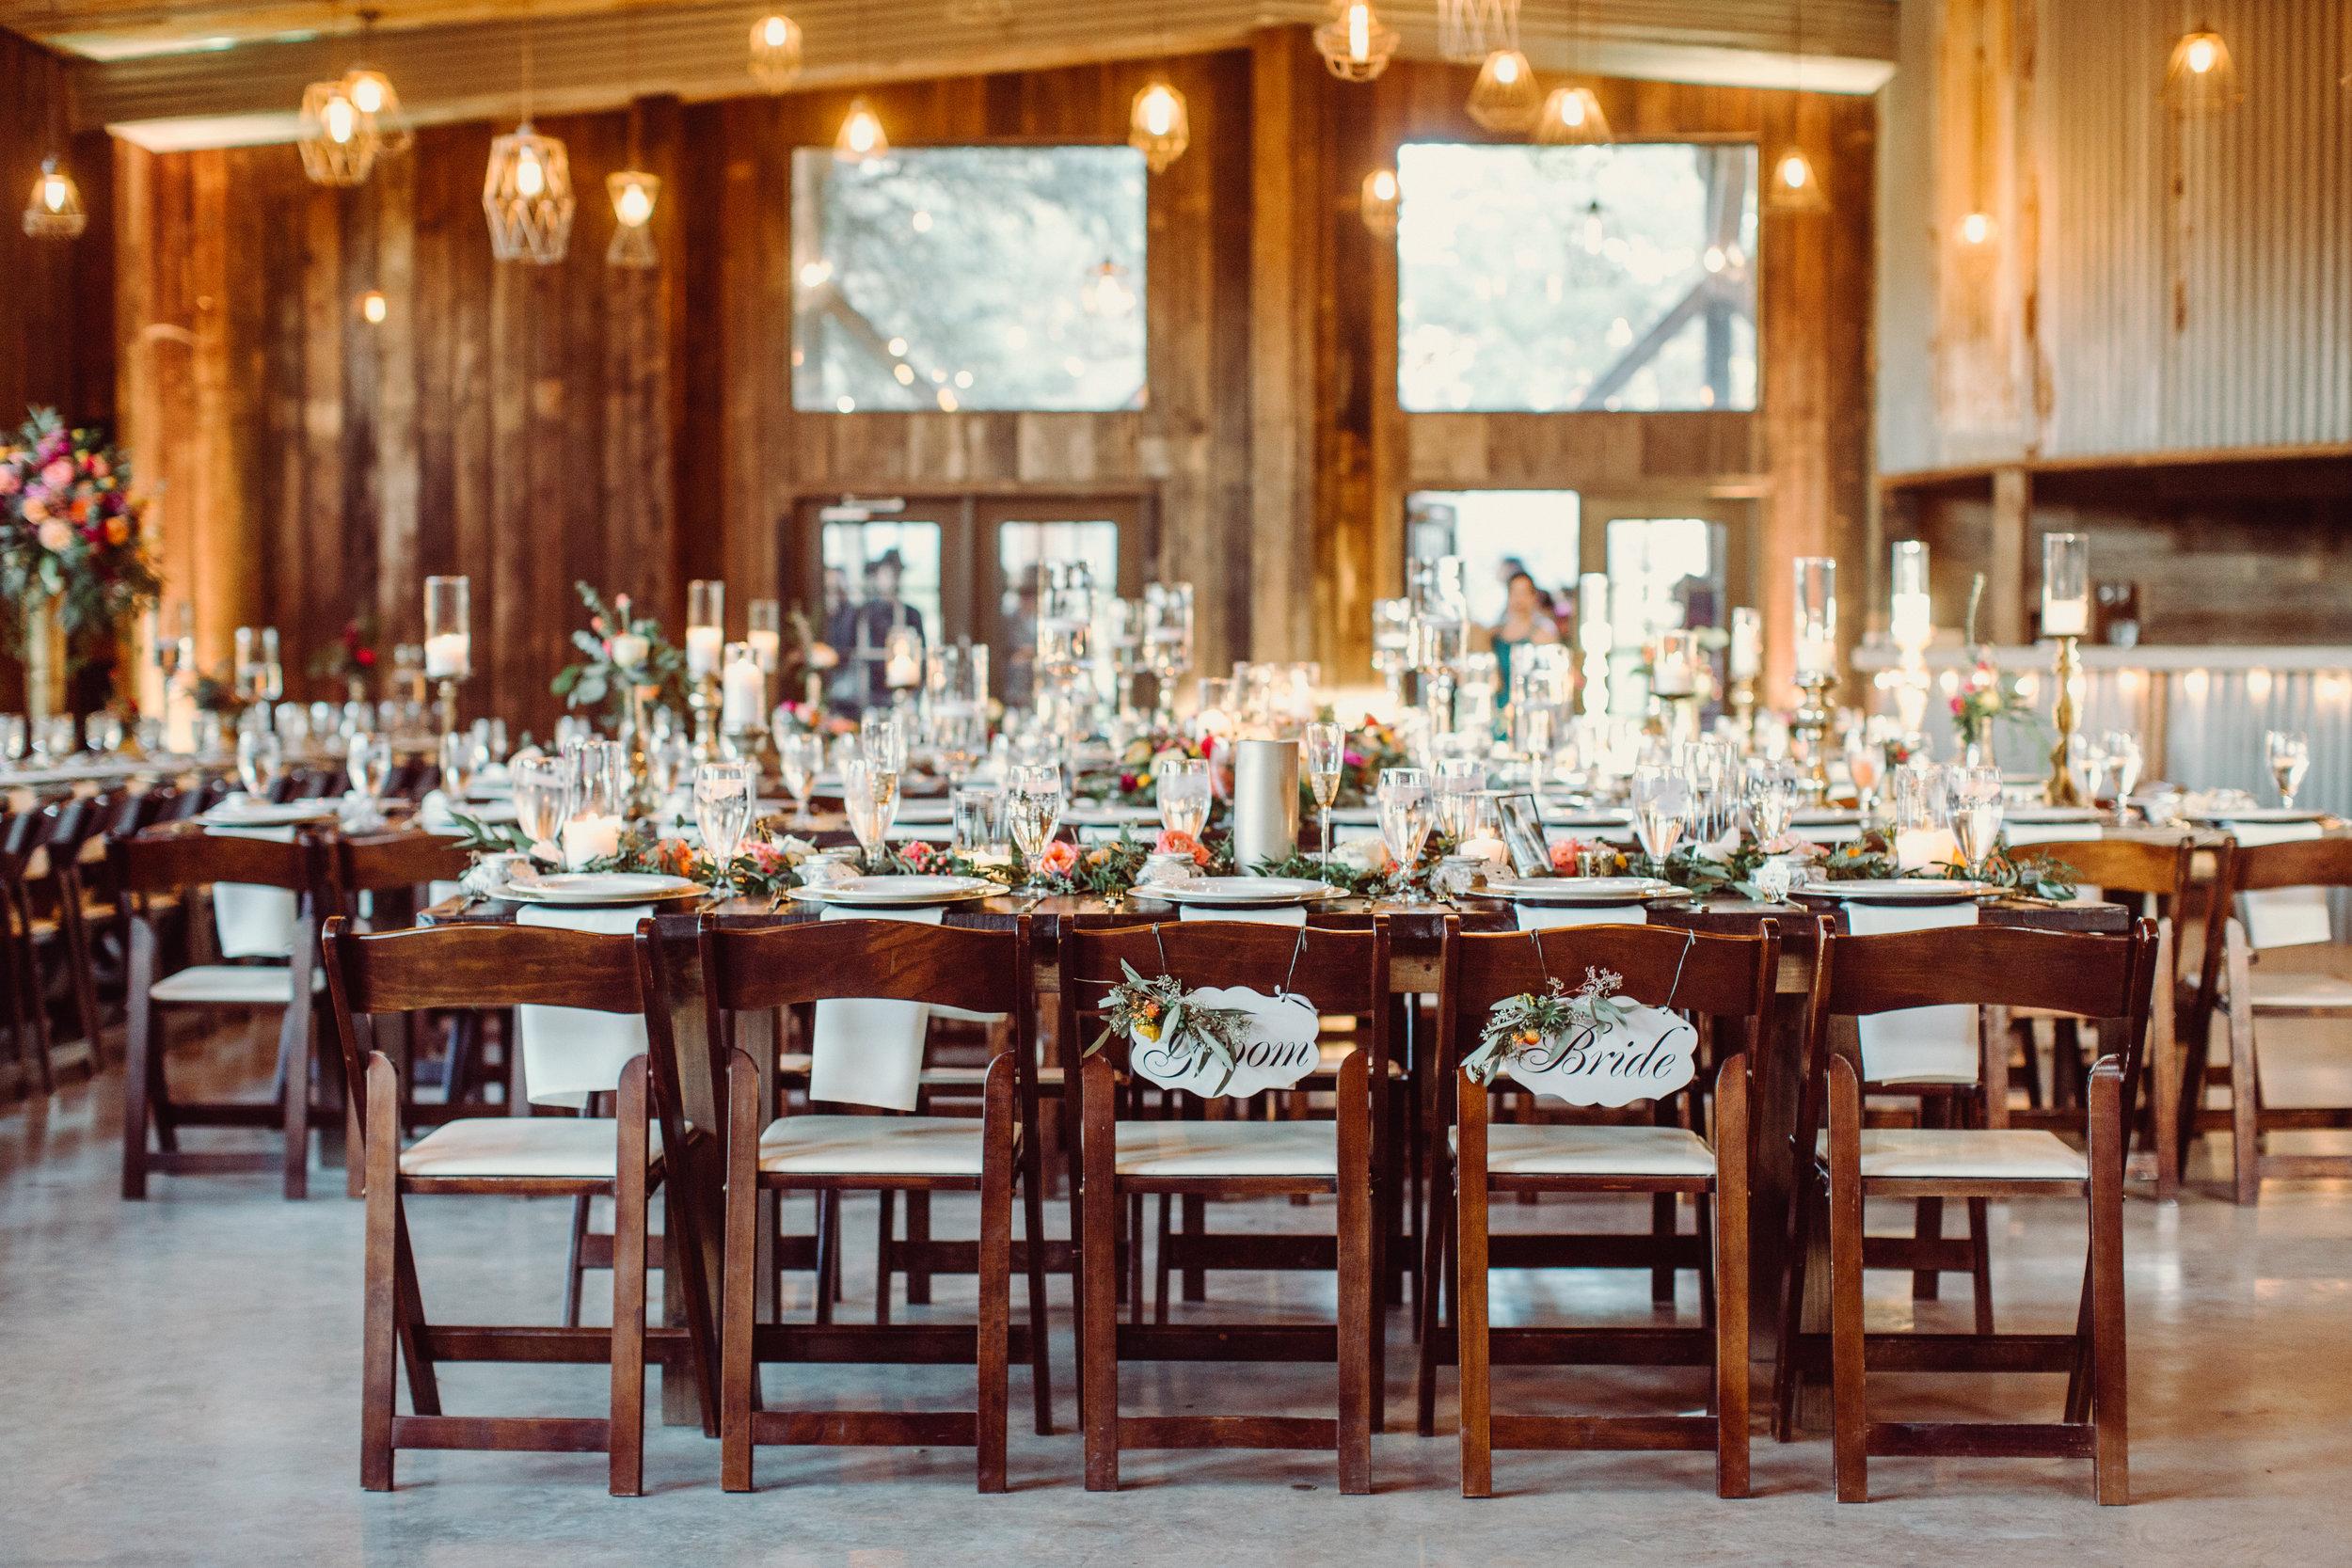 the-creek-haus-petal-pushers-reception-flowers-farm-table-fireplace-wedding-venue-vista-west-ranch